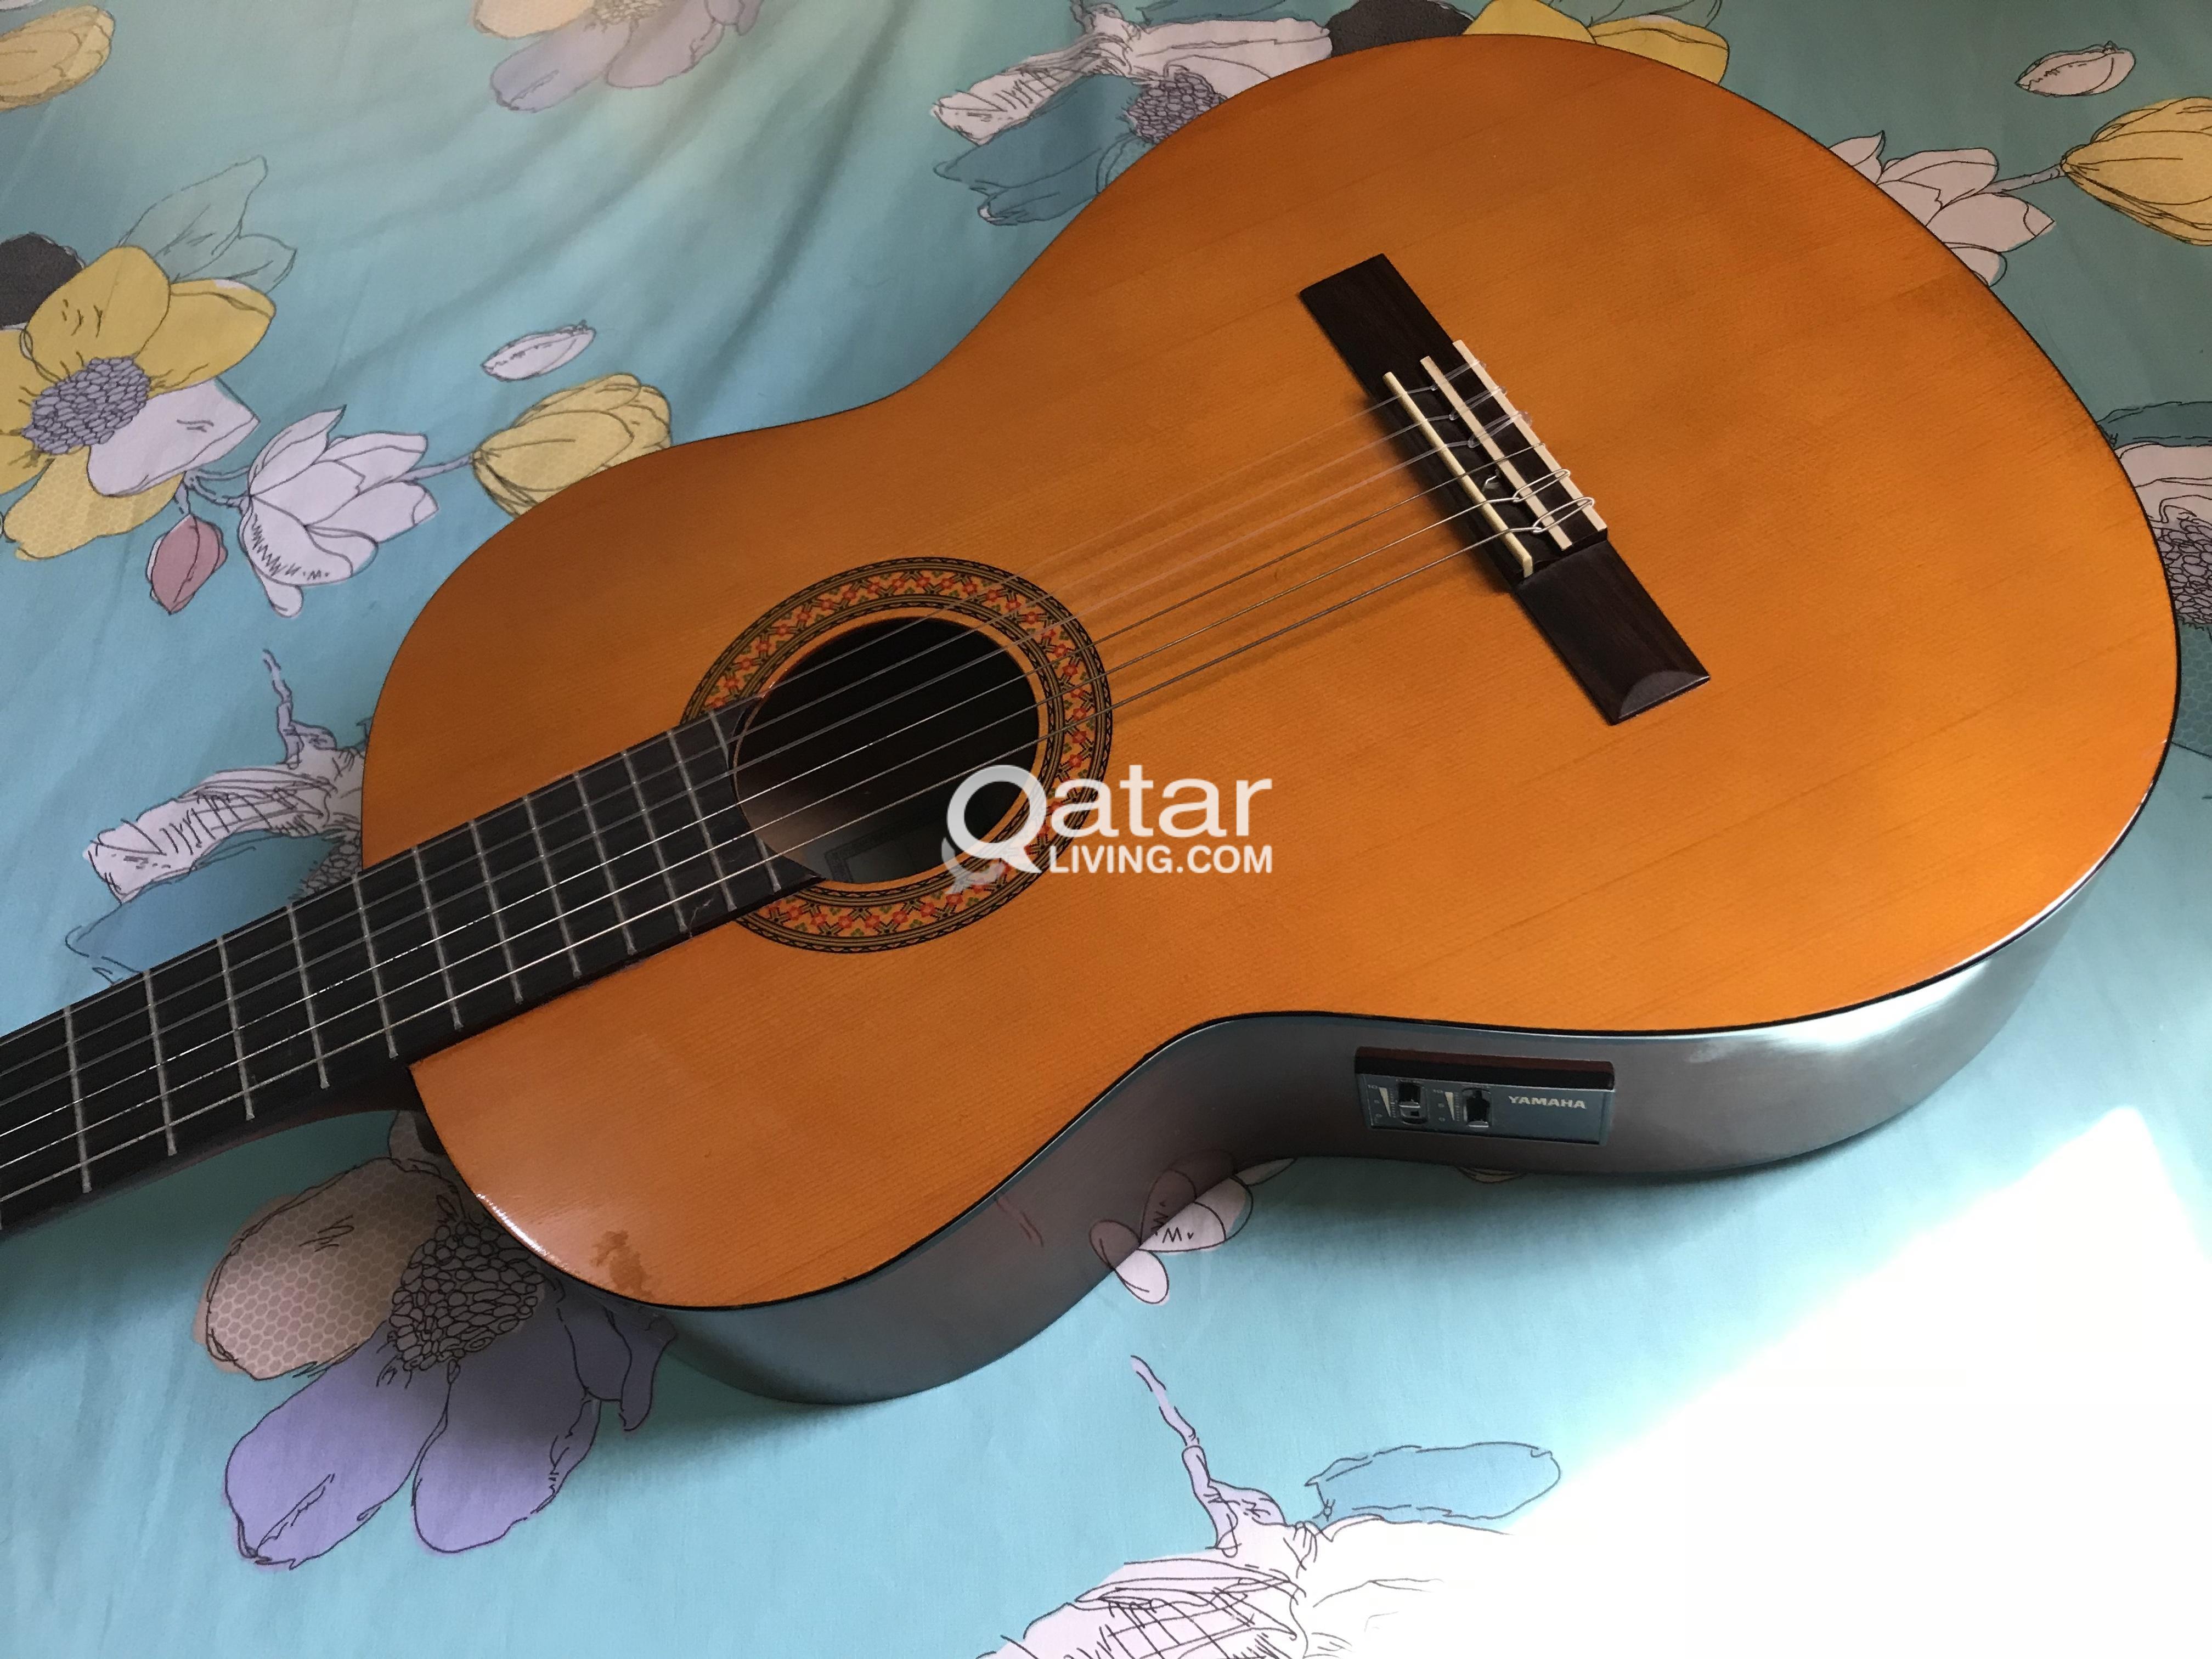 Yamaha Cx40 Acoustic Guitar Qatar Living